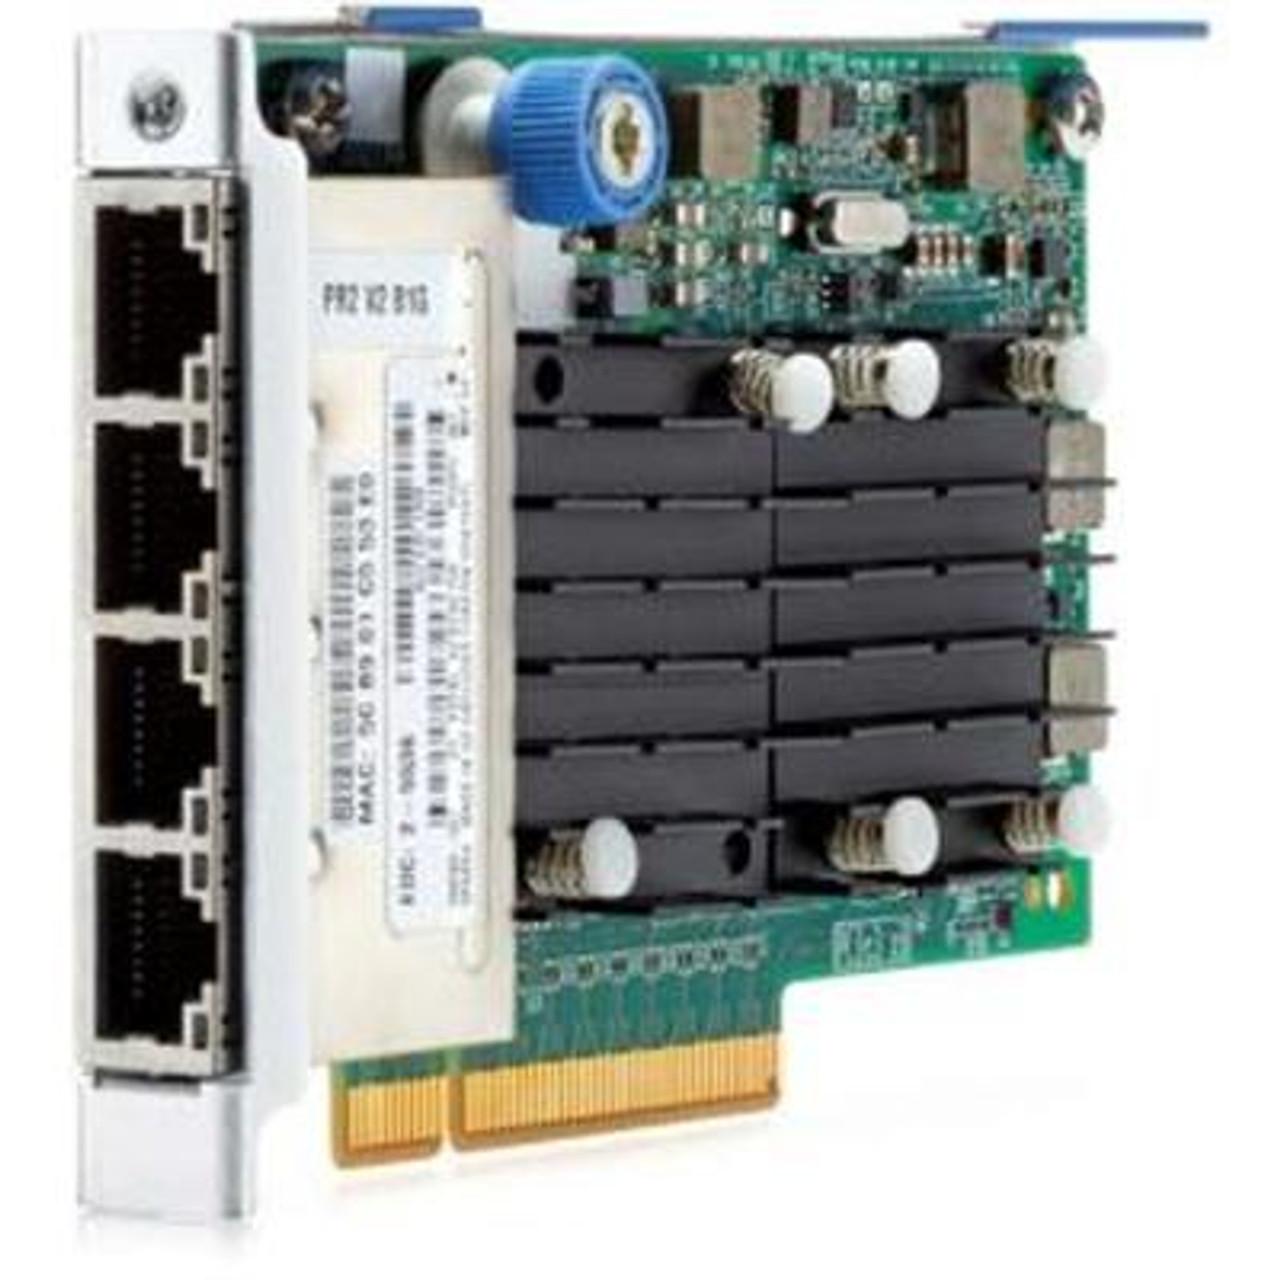 700759-B21 Compatible HP FlexFabric 10GB 2-Port 533FLR-T Adapter Renewed